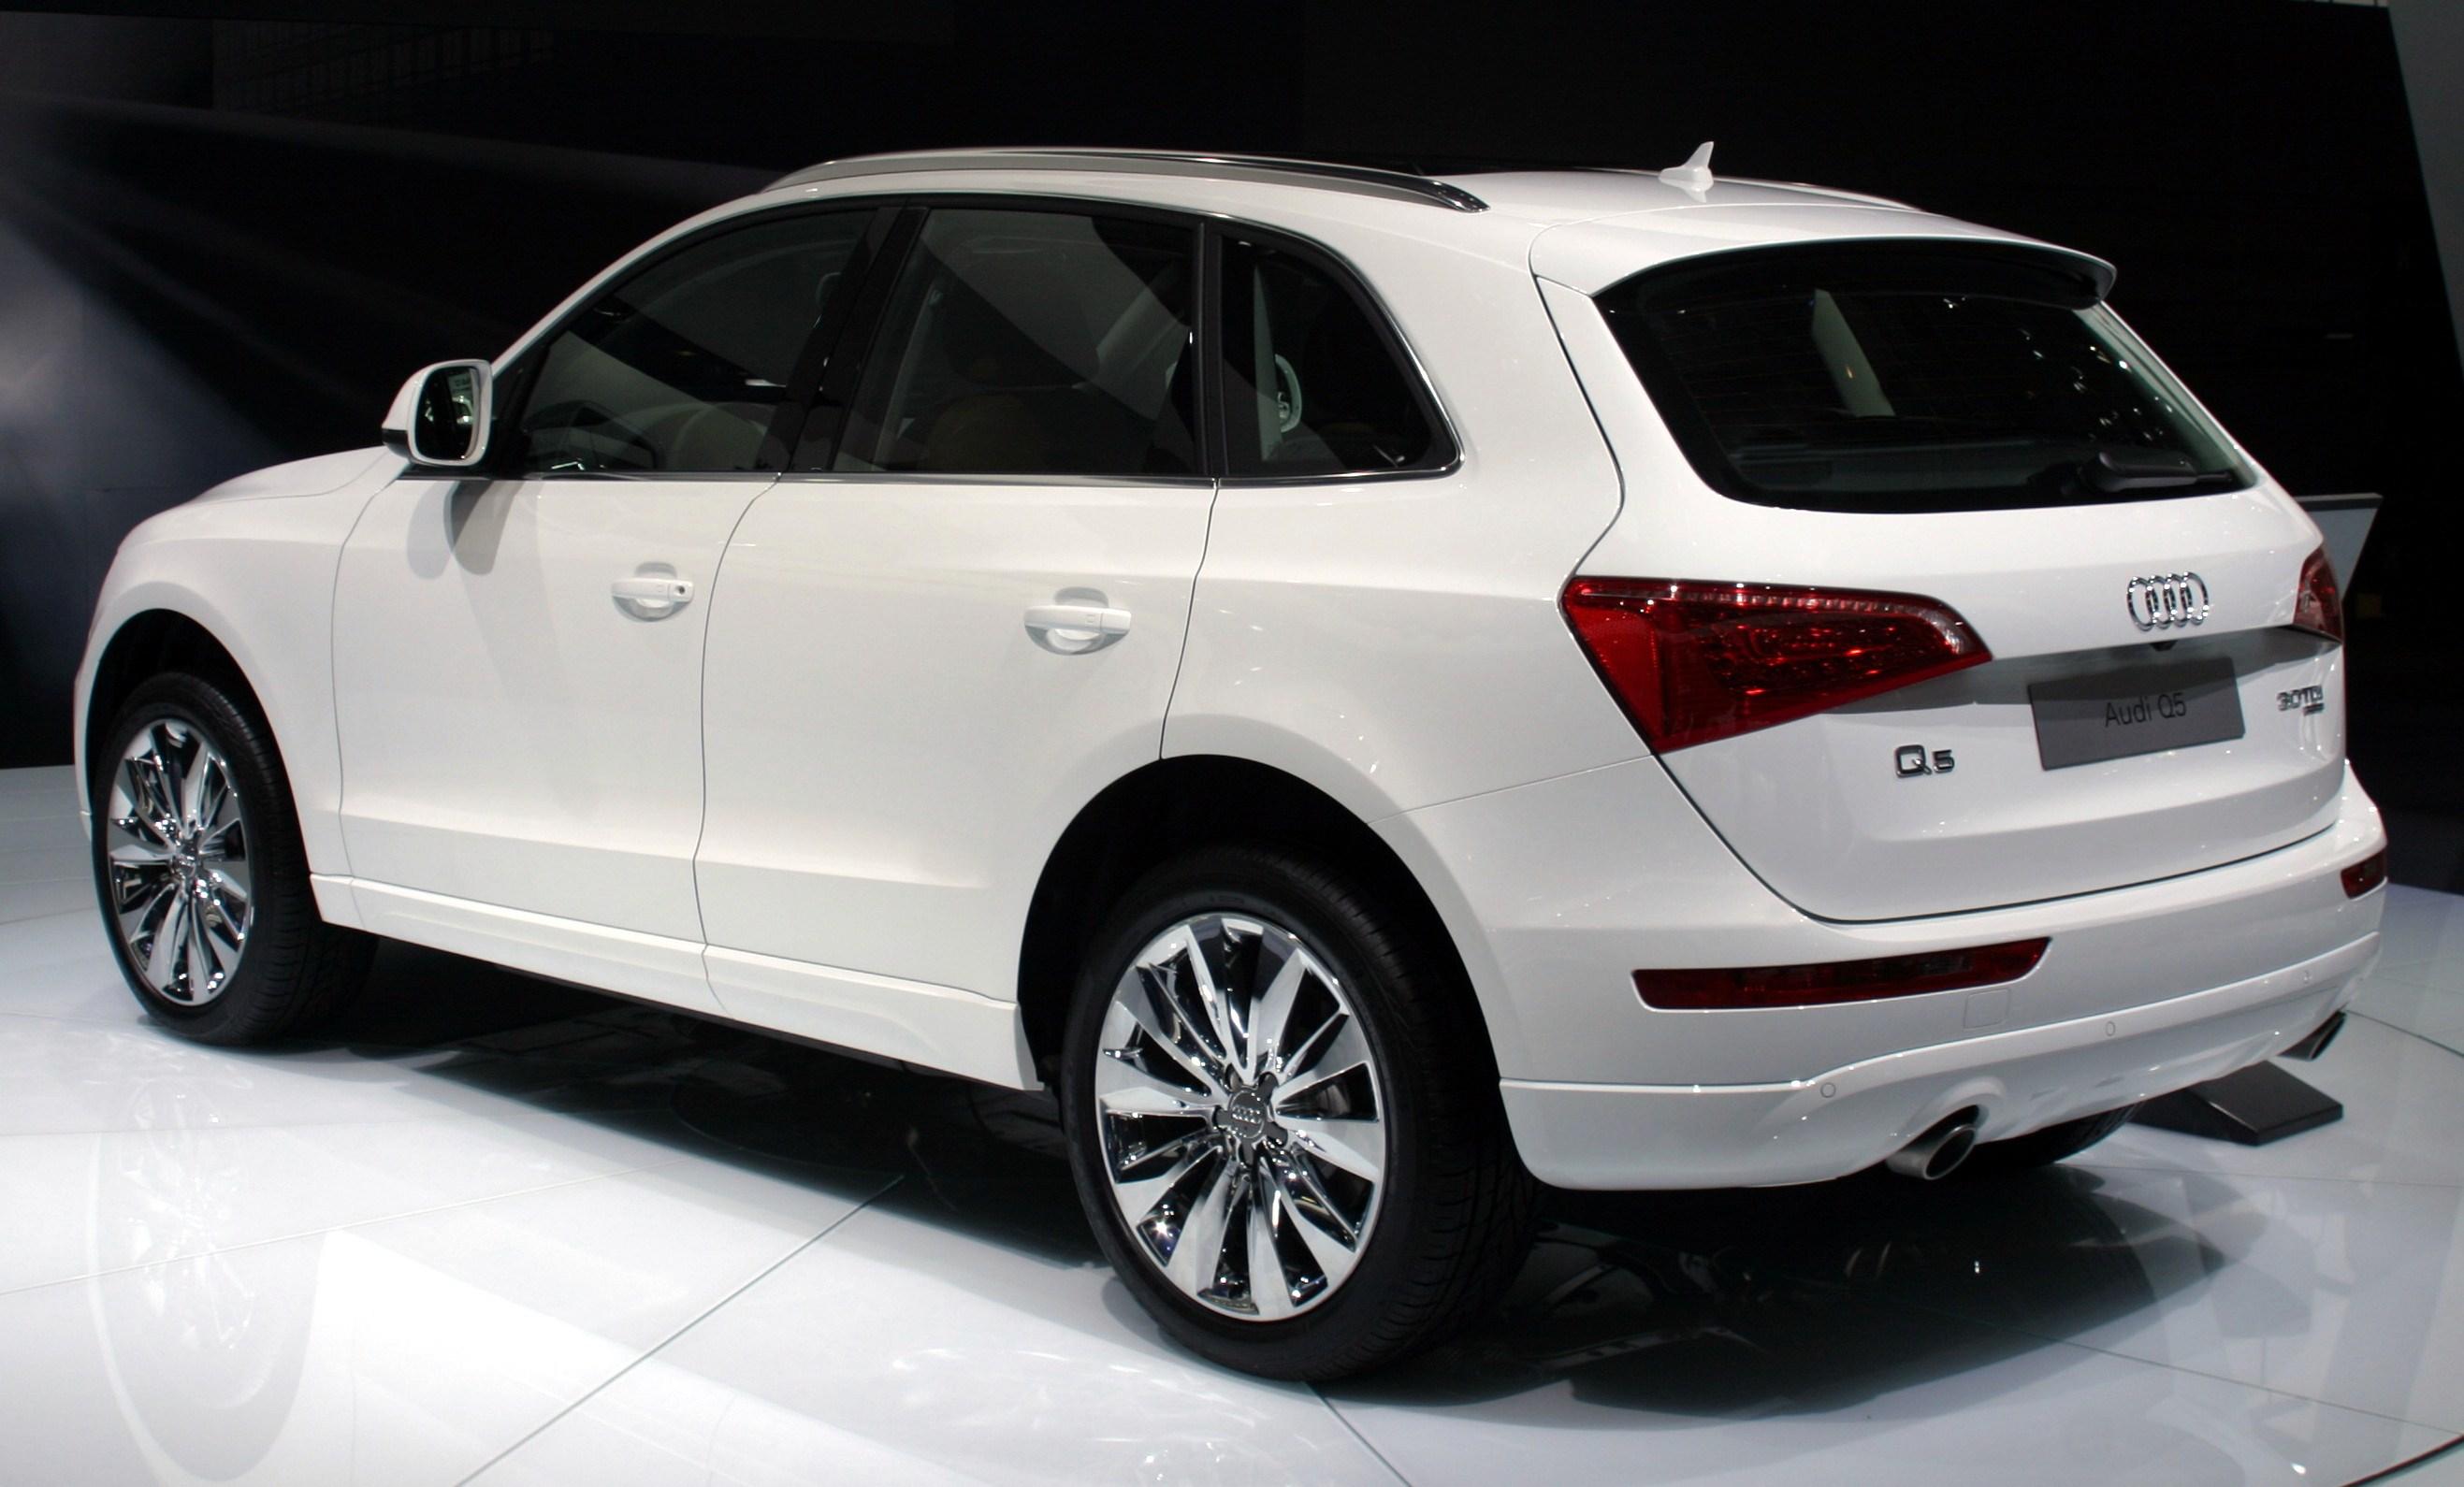 File Audi Q5 Rear White Moscow Autoshow 2008 27 08 Jpg